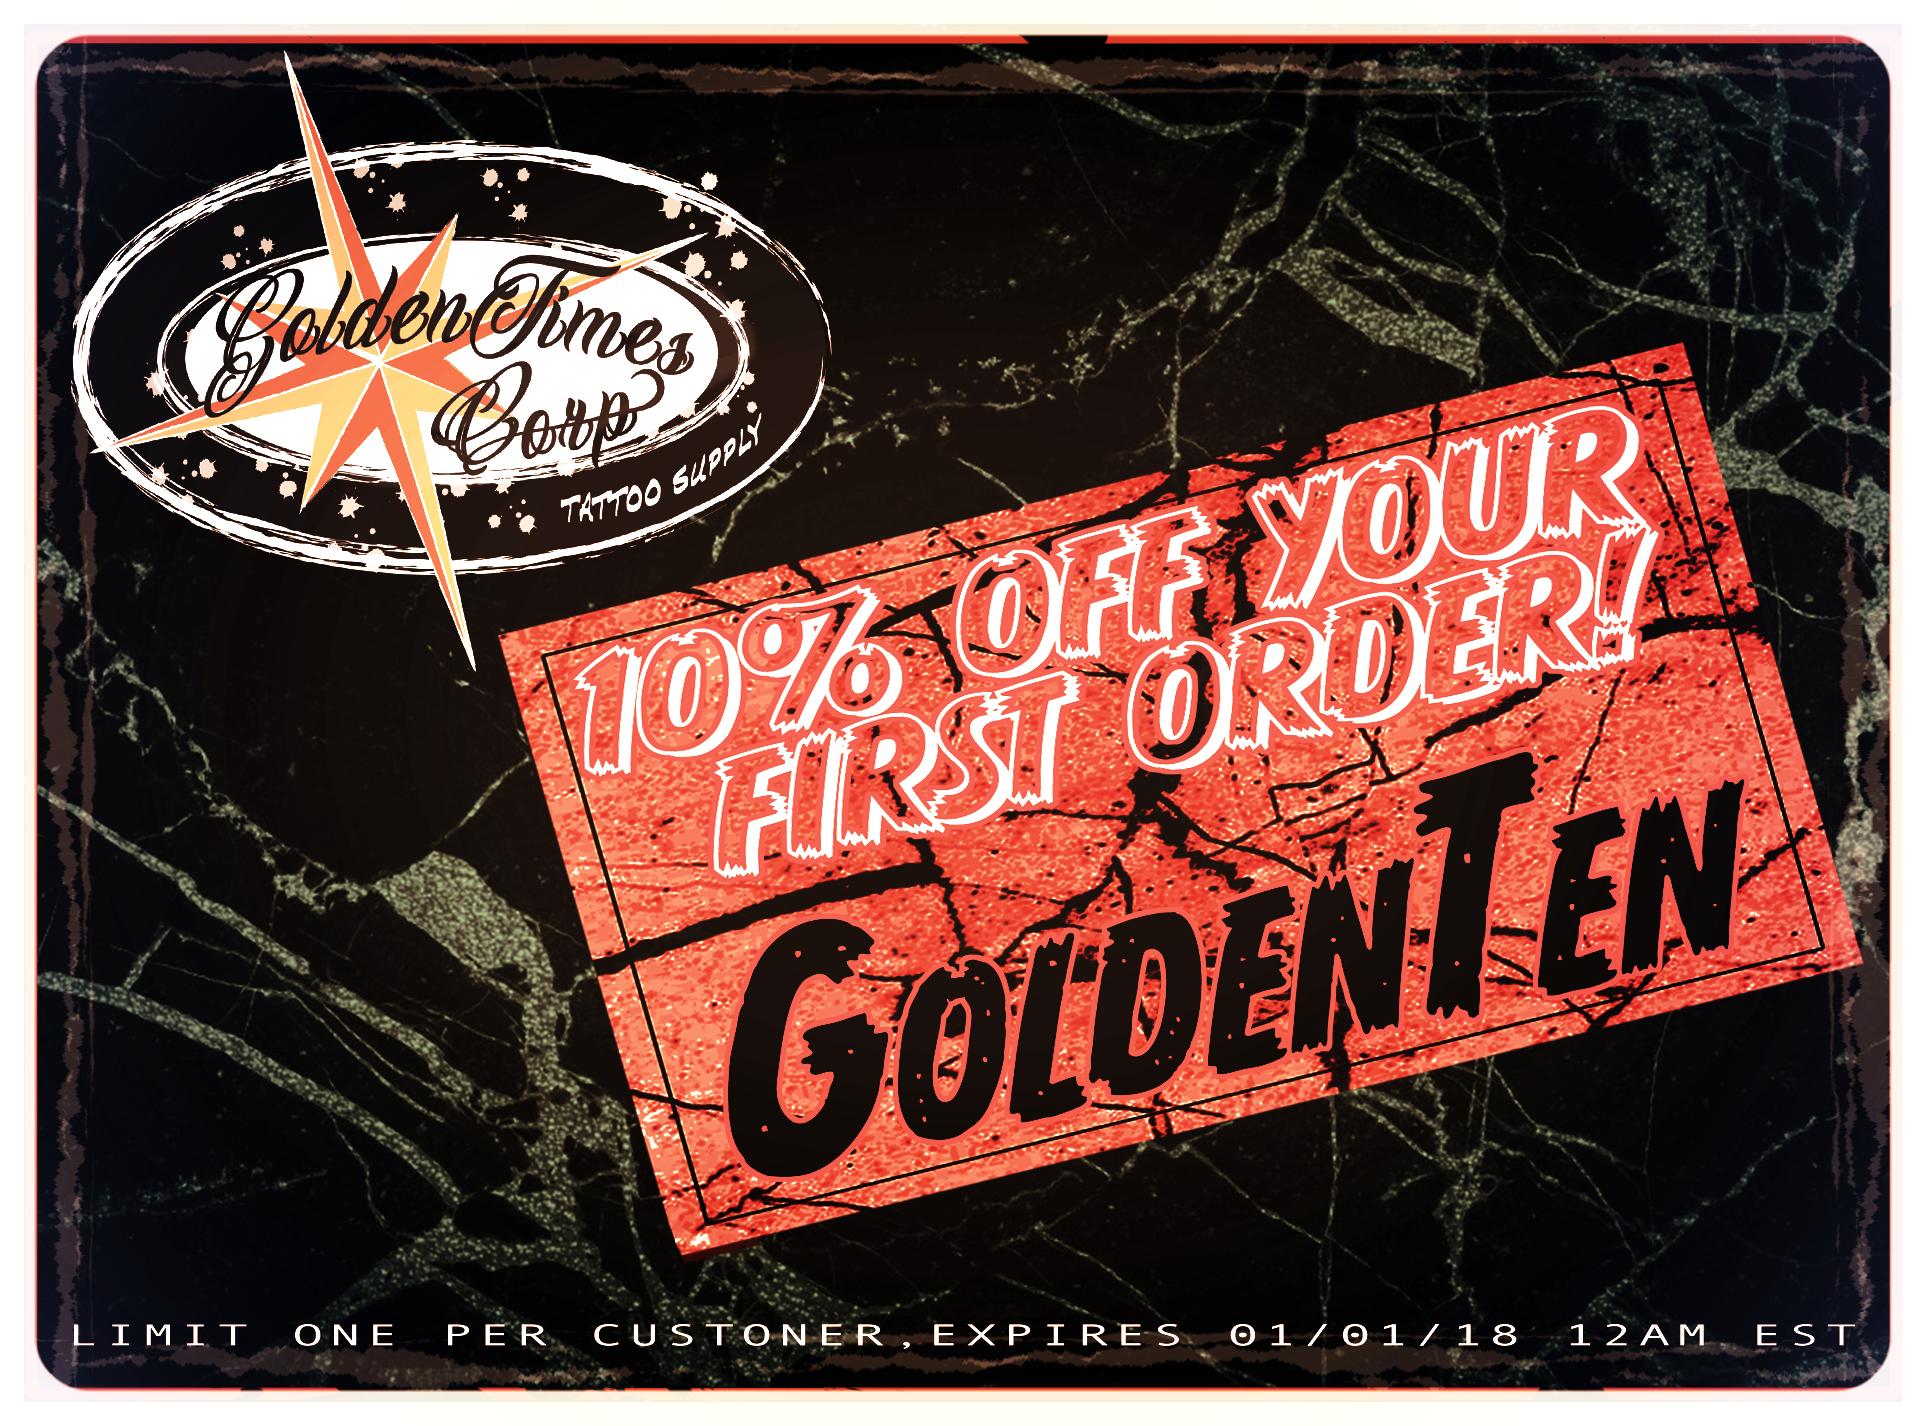 PROMO-CODE: GoldenTen FOR 10% OFF YOUR 1st ORDER! -